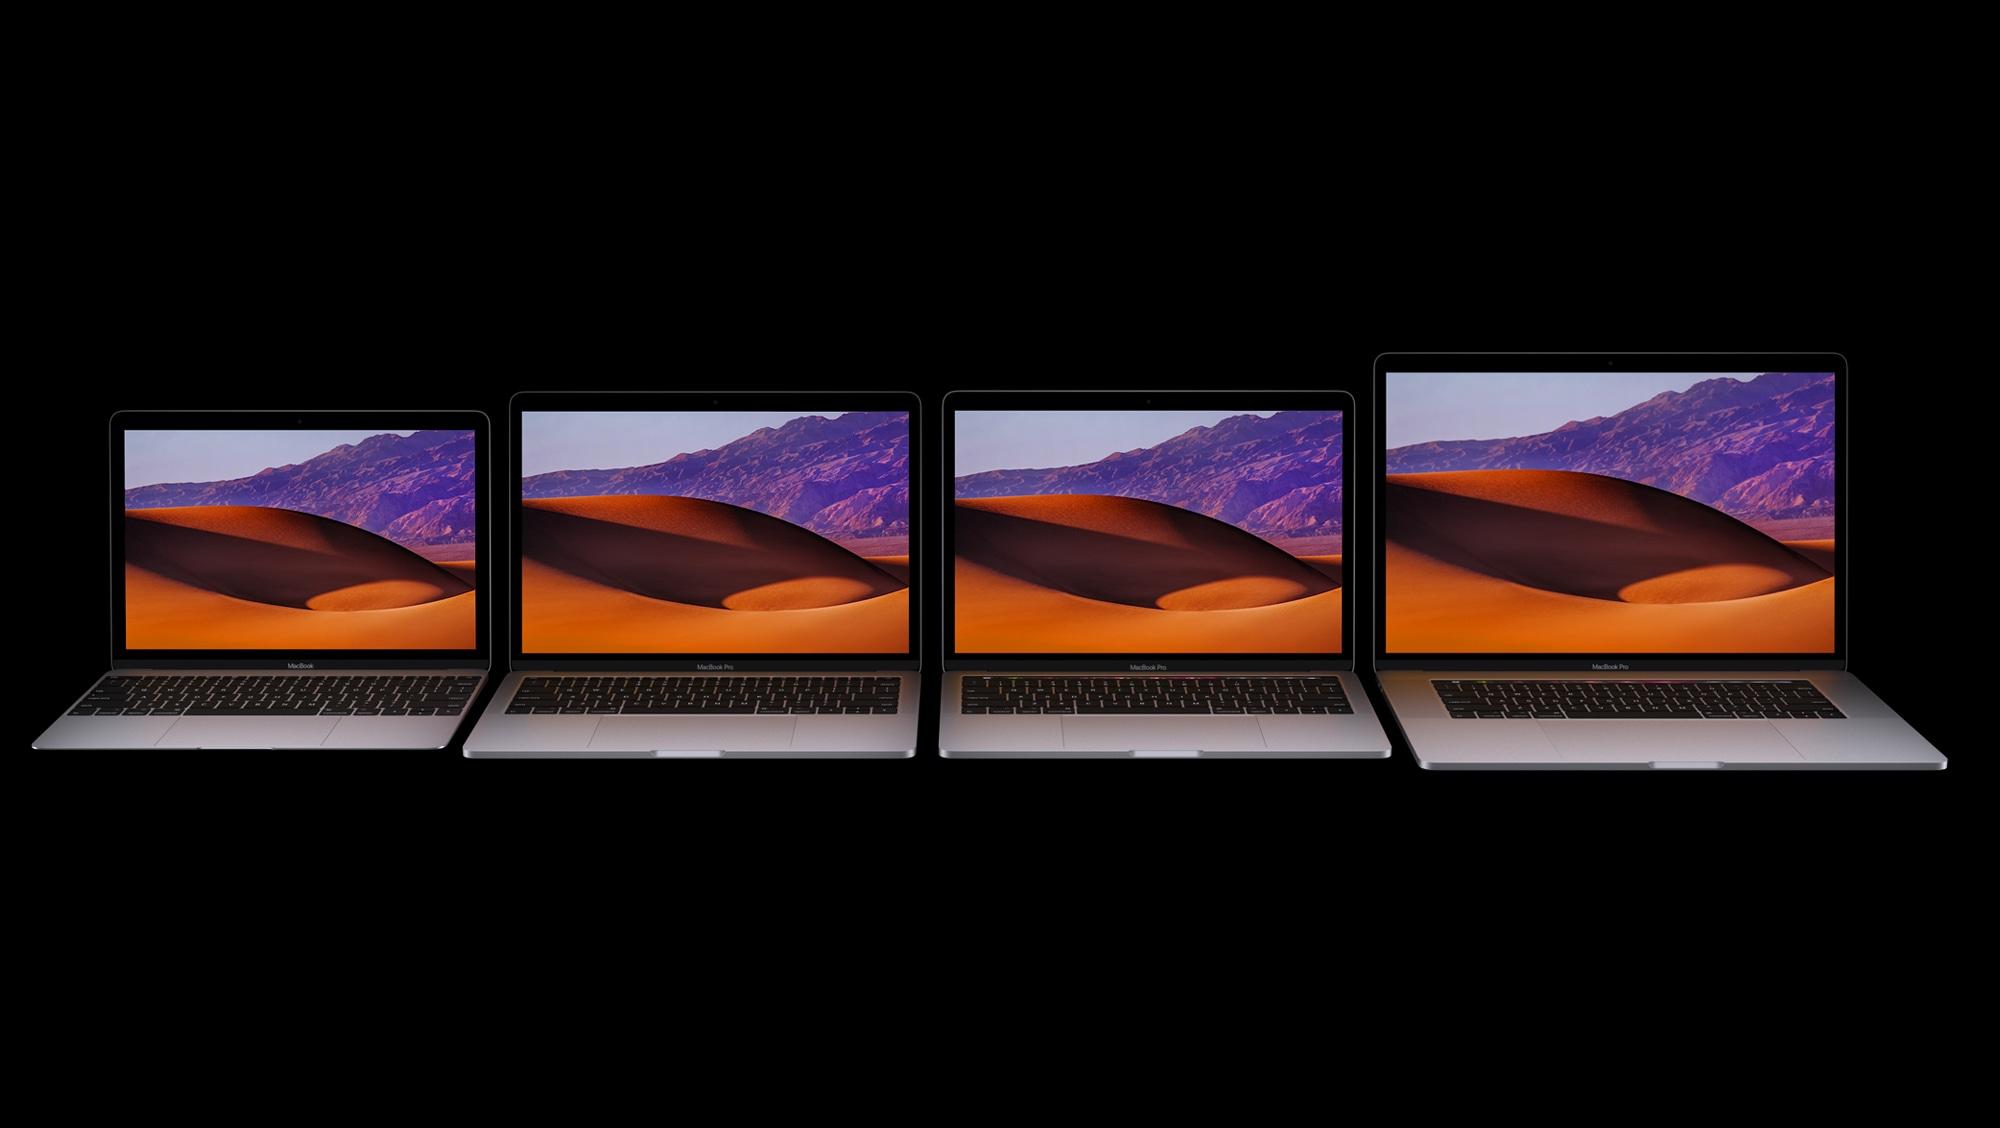 Família de MacBooks de frente